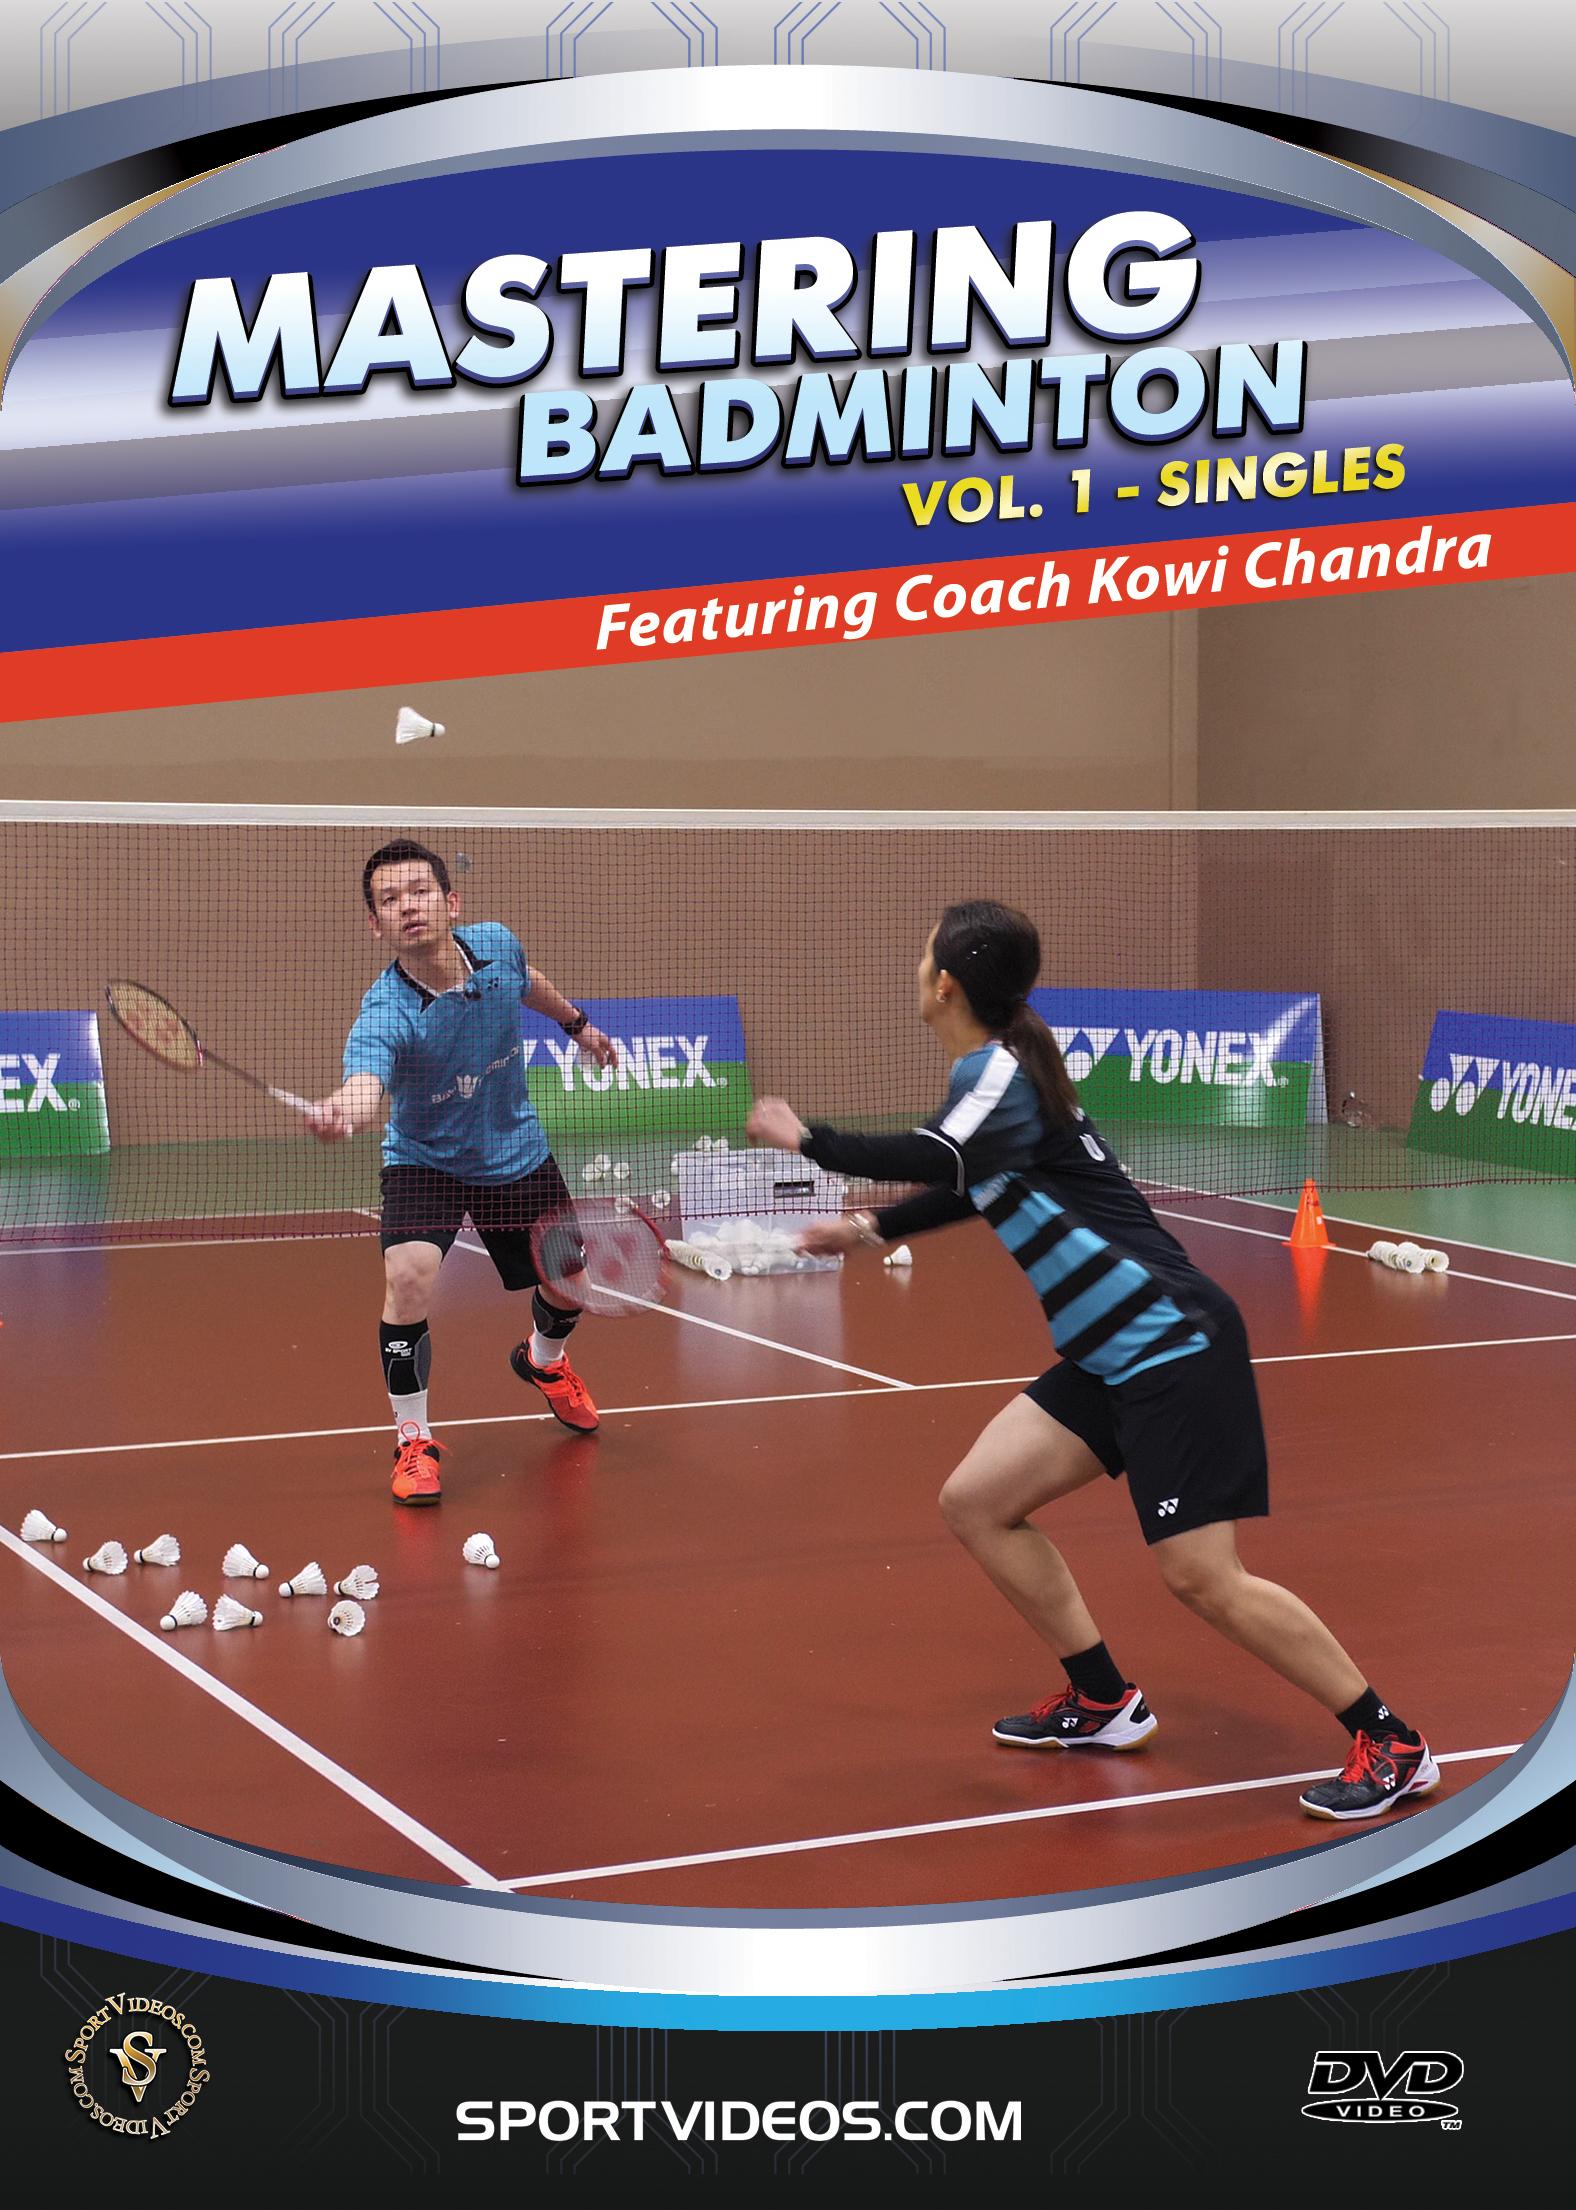 Mastering Badminton Vol. 1 - Singles DVD or Download - Coming in April 2019.